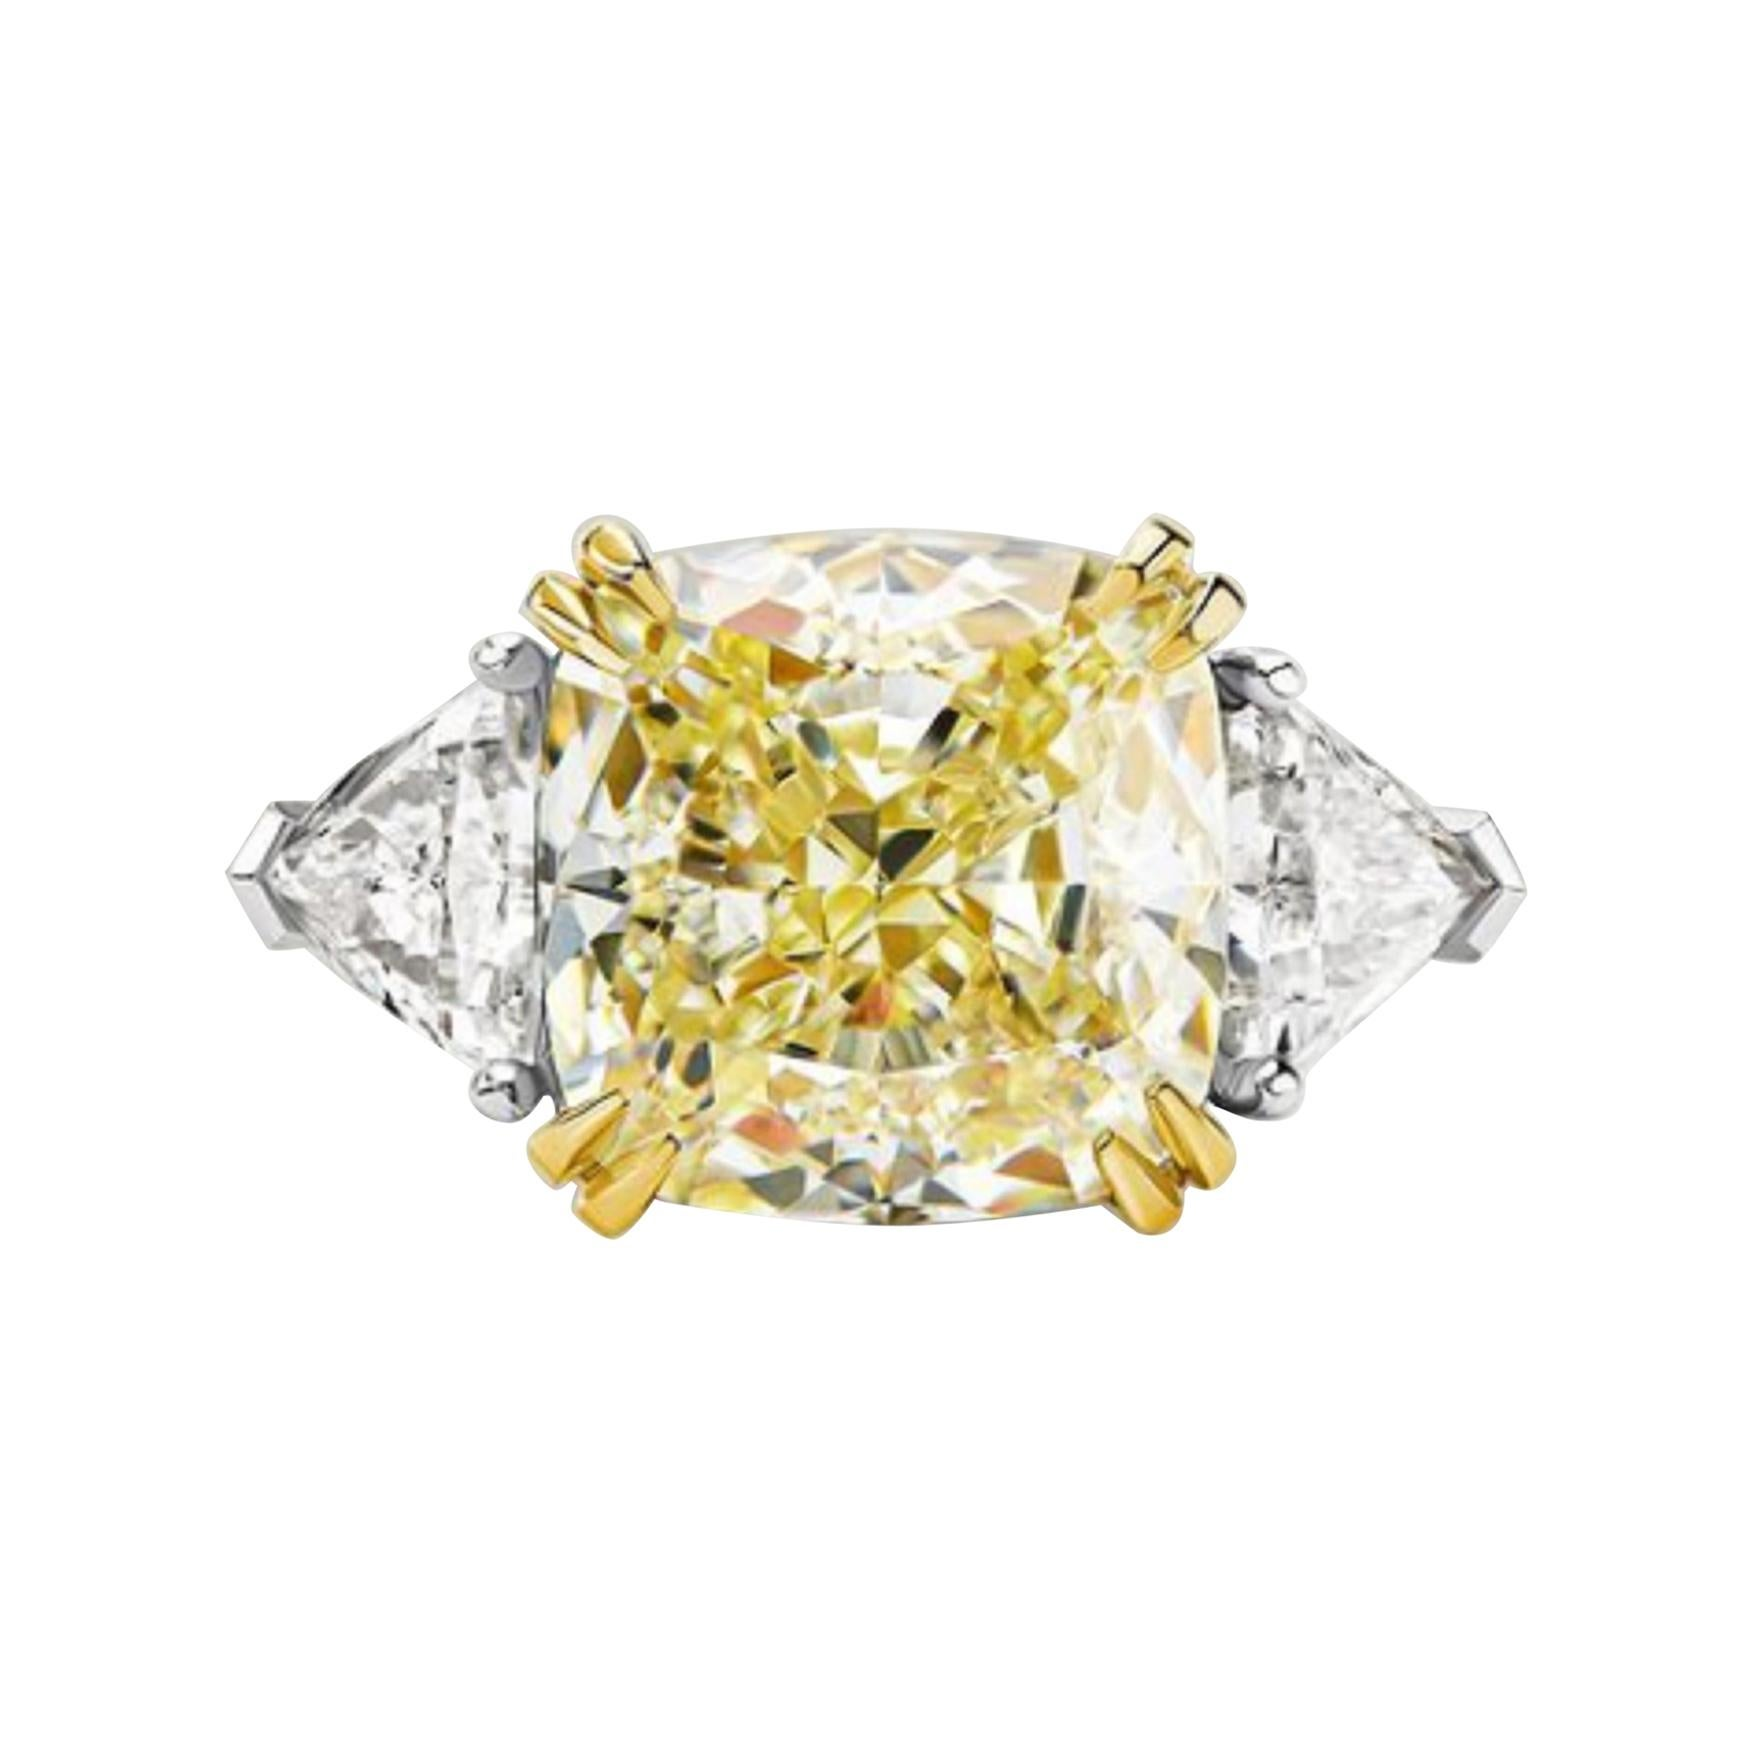 GIA Certified 4.65 Carat Fancy Light Yellow Cushion Three Stone Diamond Ring